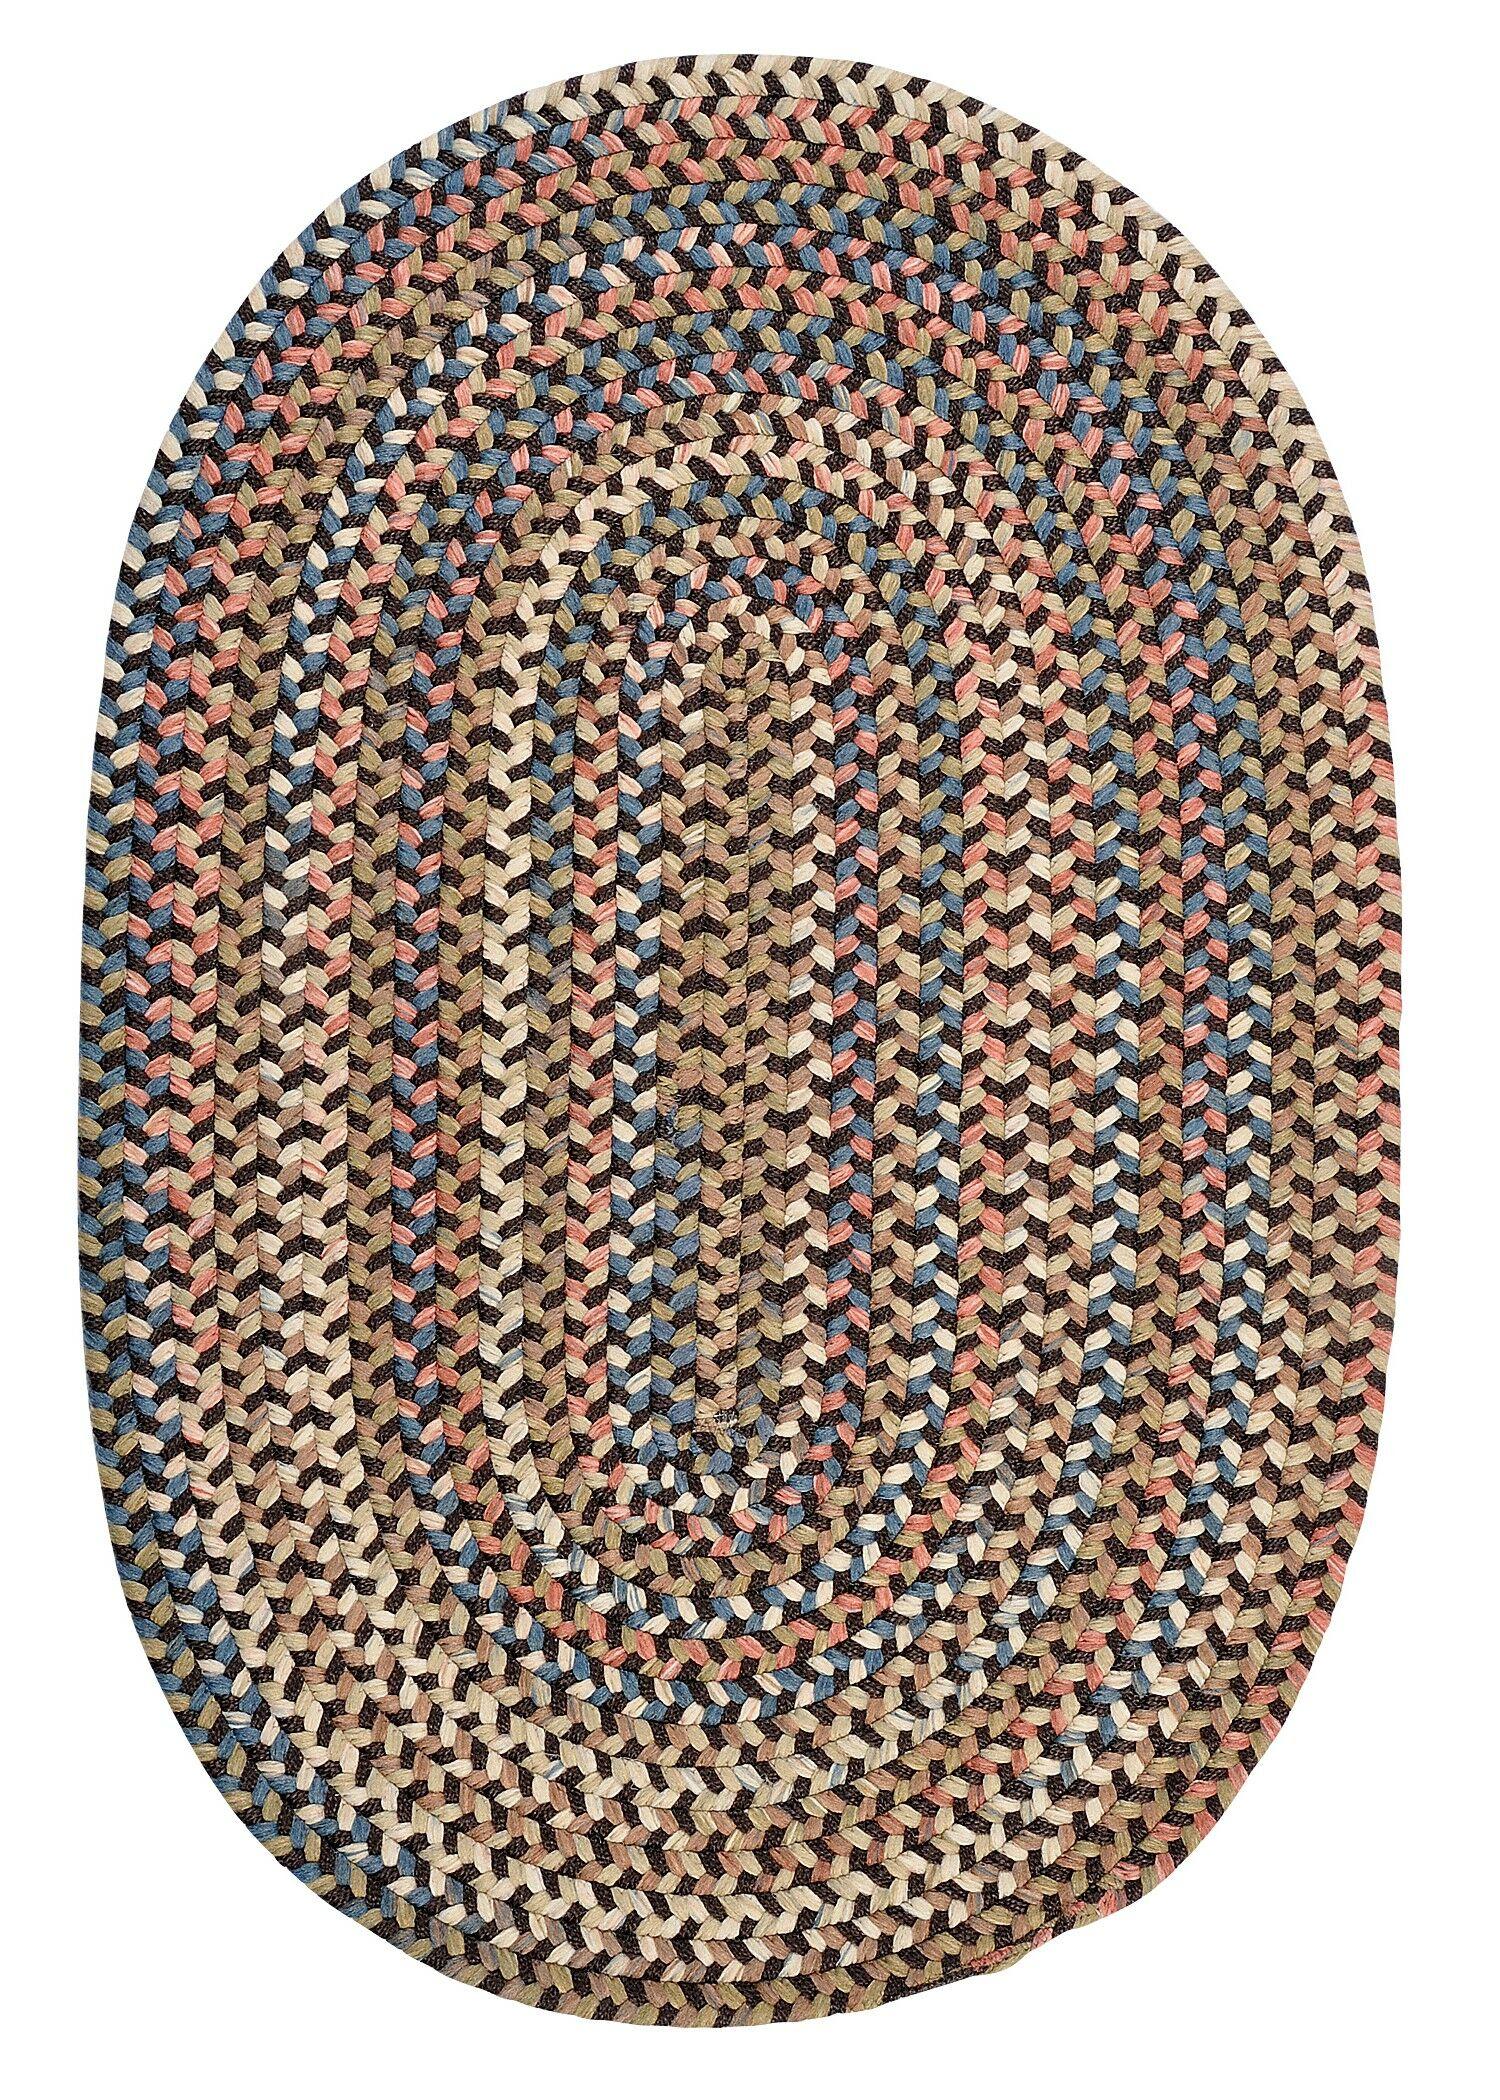 Kipton Dark Brown Area Rug Rug Size: Oval 12' x 15'